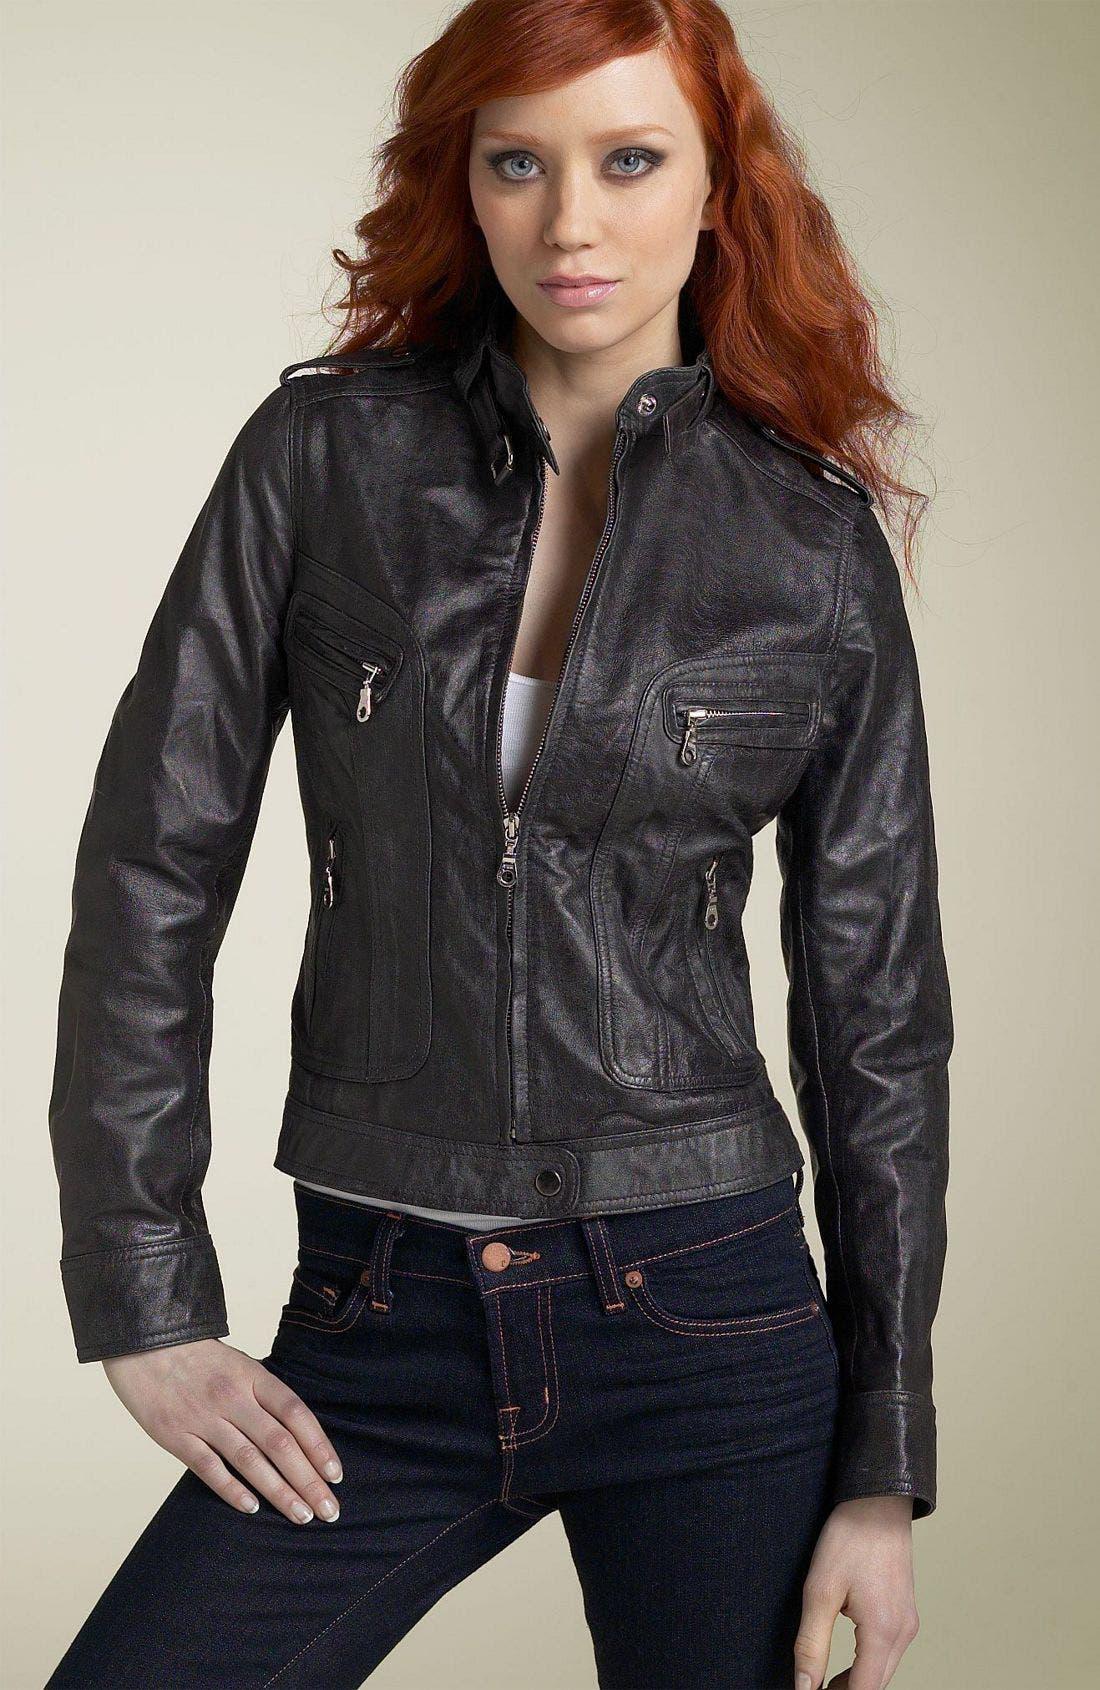 Kenna-T Motorcycle Jacket,                         Main,                         color, Distressed Black